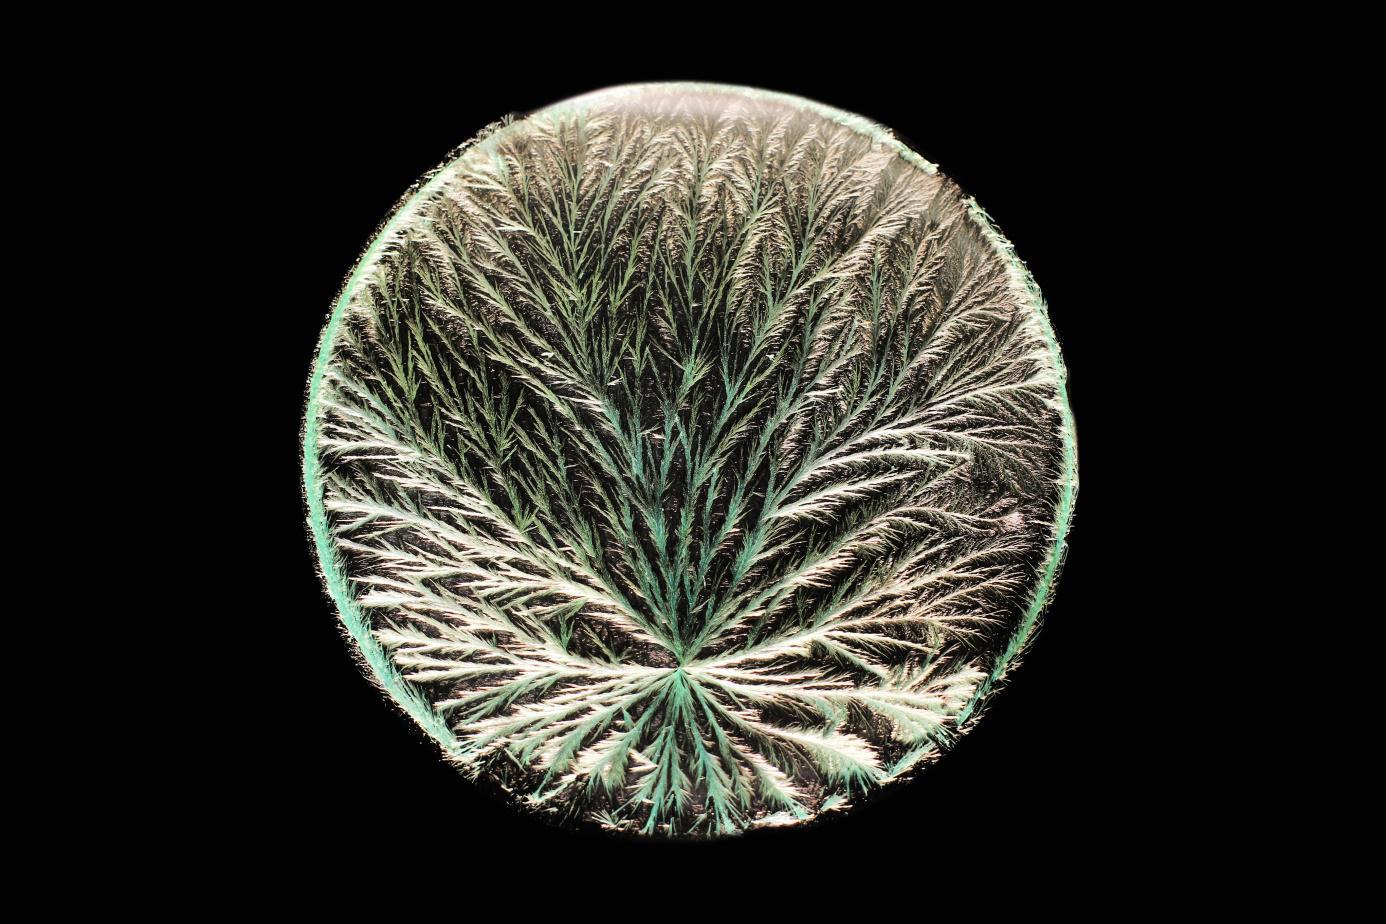 Mikroskopisches Kristallisationsbild Mykoplan Cordyceps